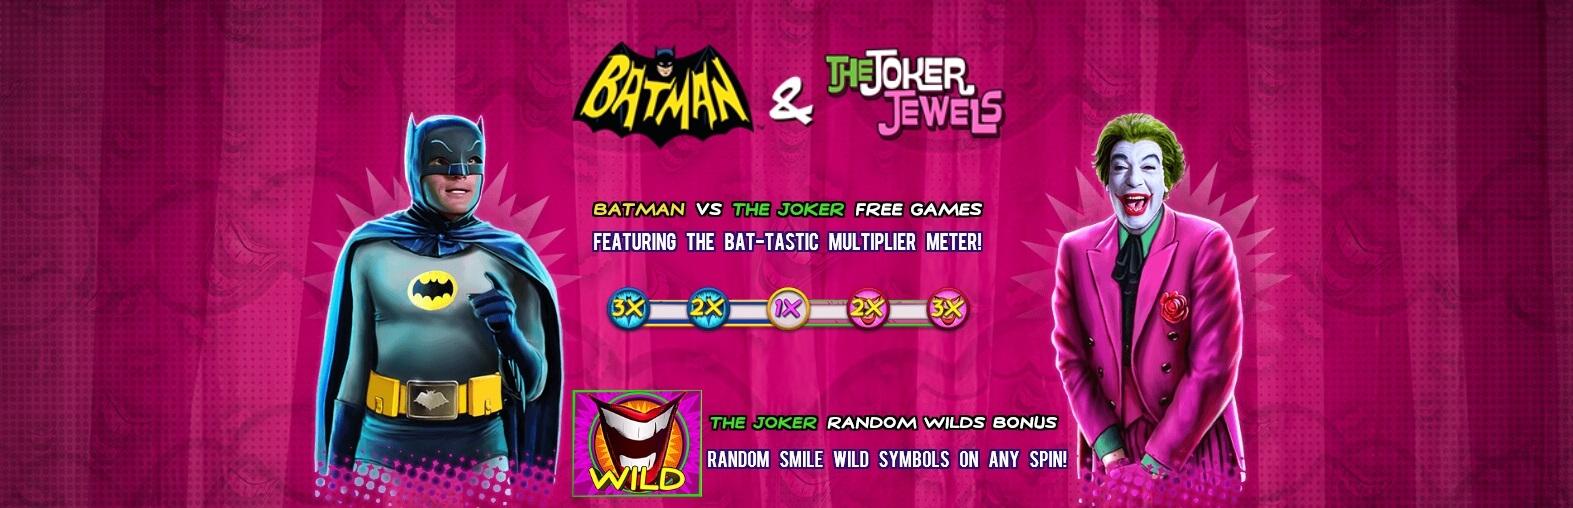 Batman-and-the-Joker-Jewels